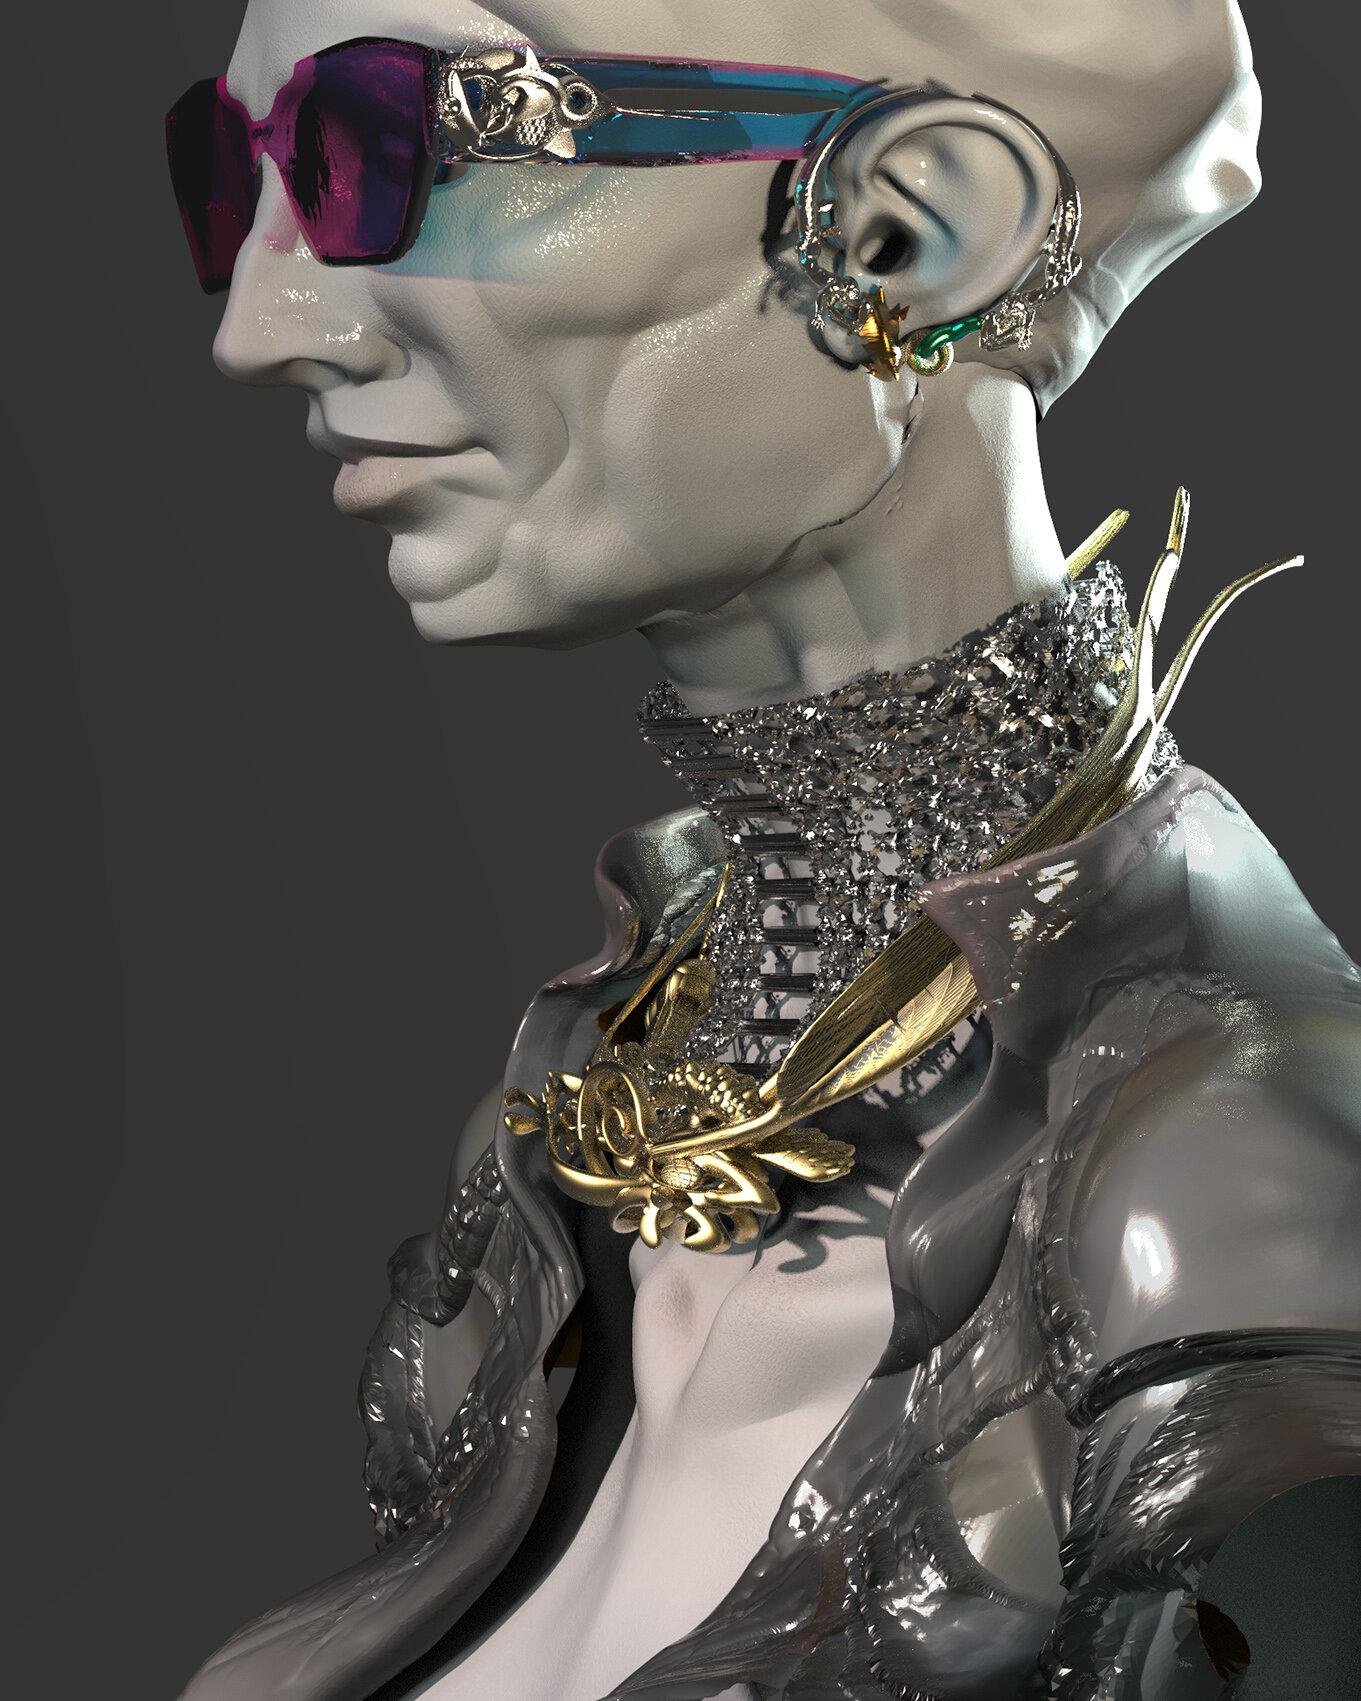 Max Brazier-Jones necklas & glasses-.jpg